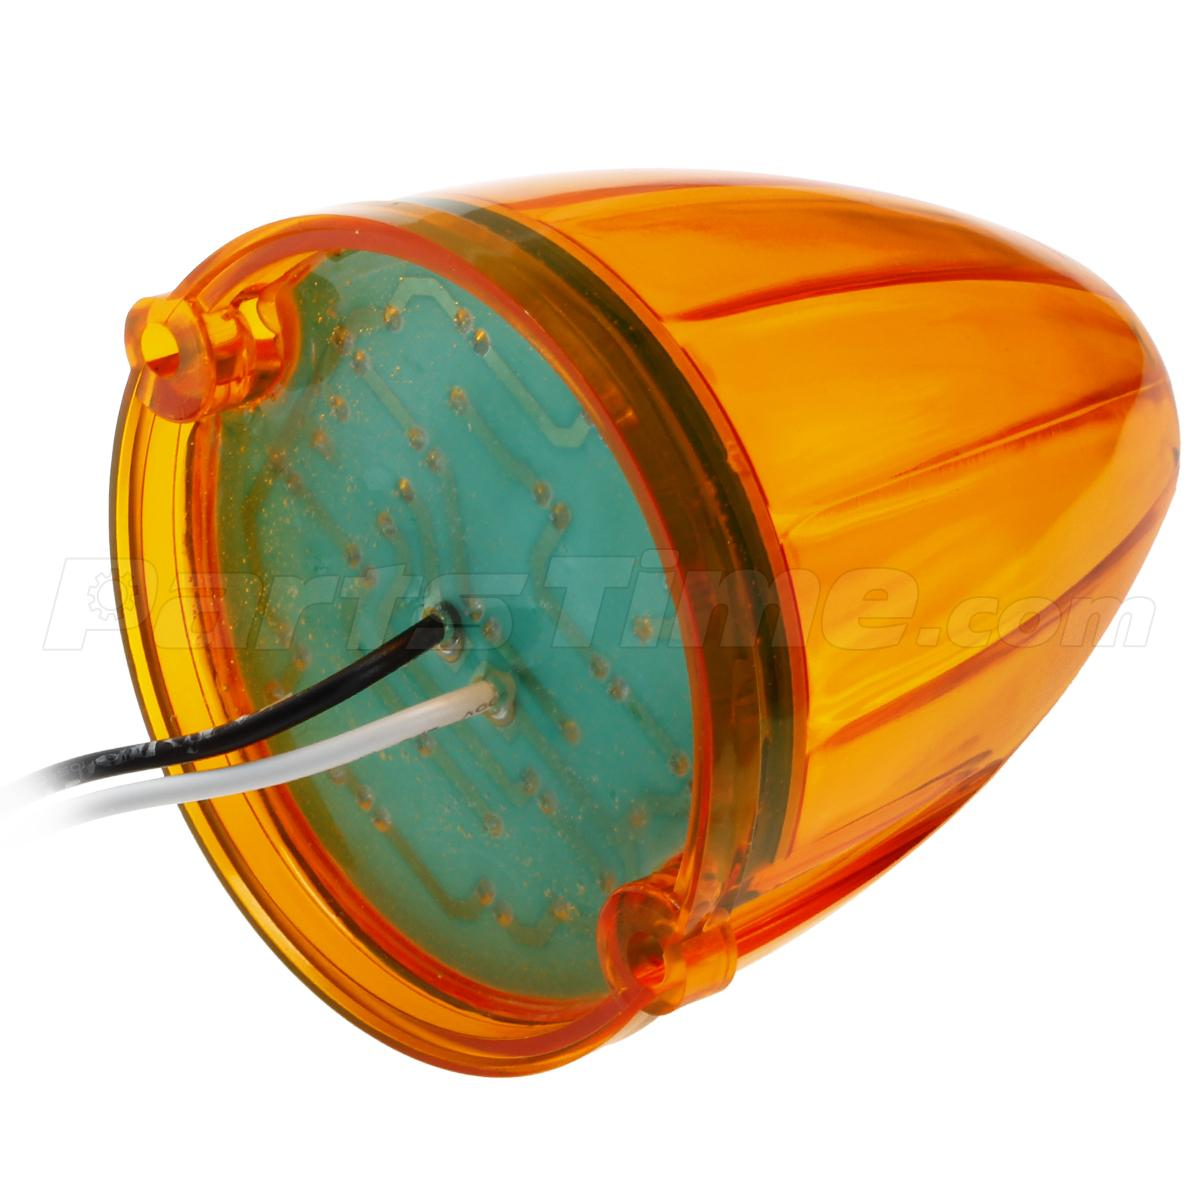 cab marker clearance lights amber 17 led replacement lens. Black Bedroom Furniture Sets. Home Design Ideas